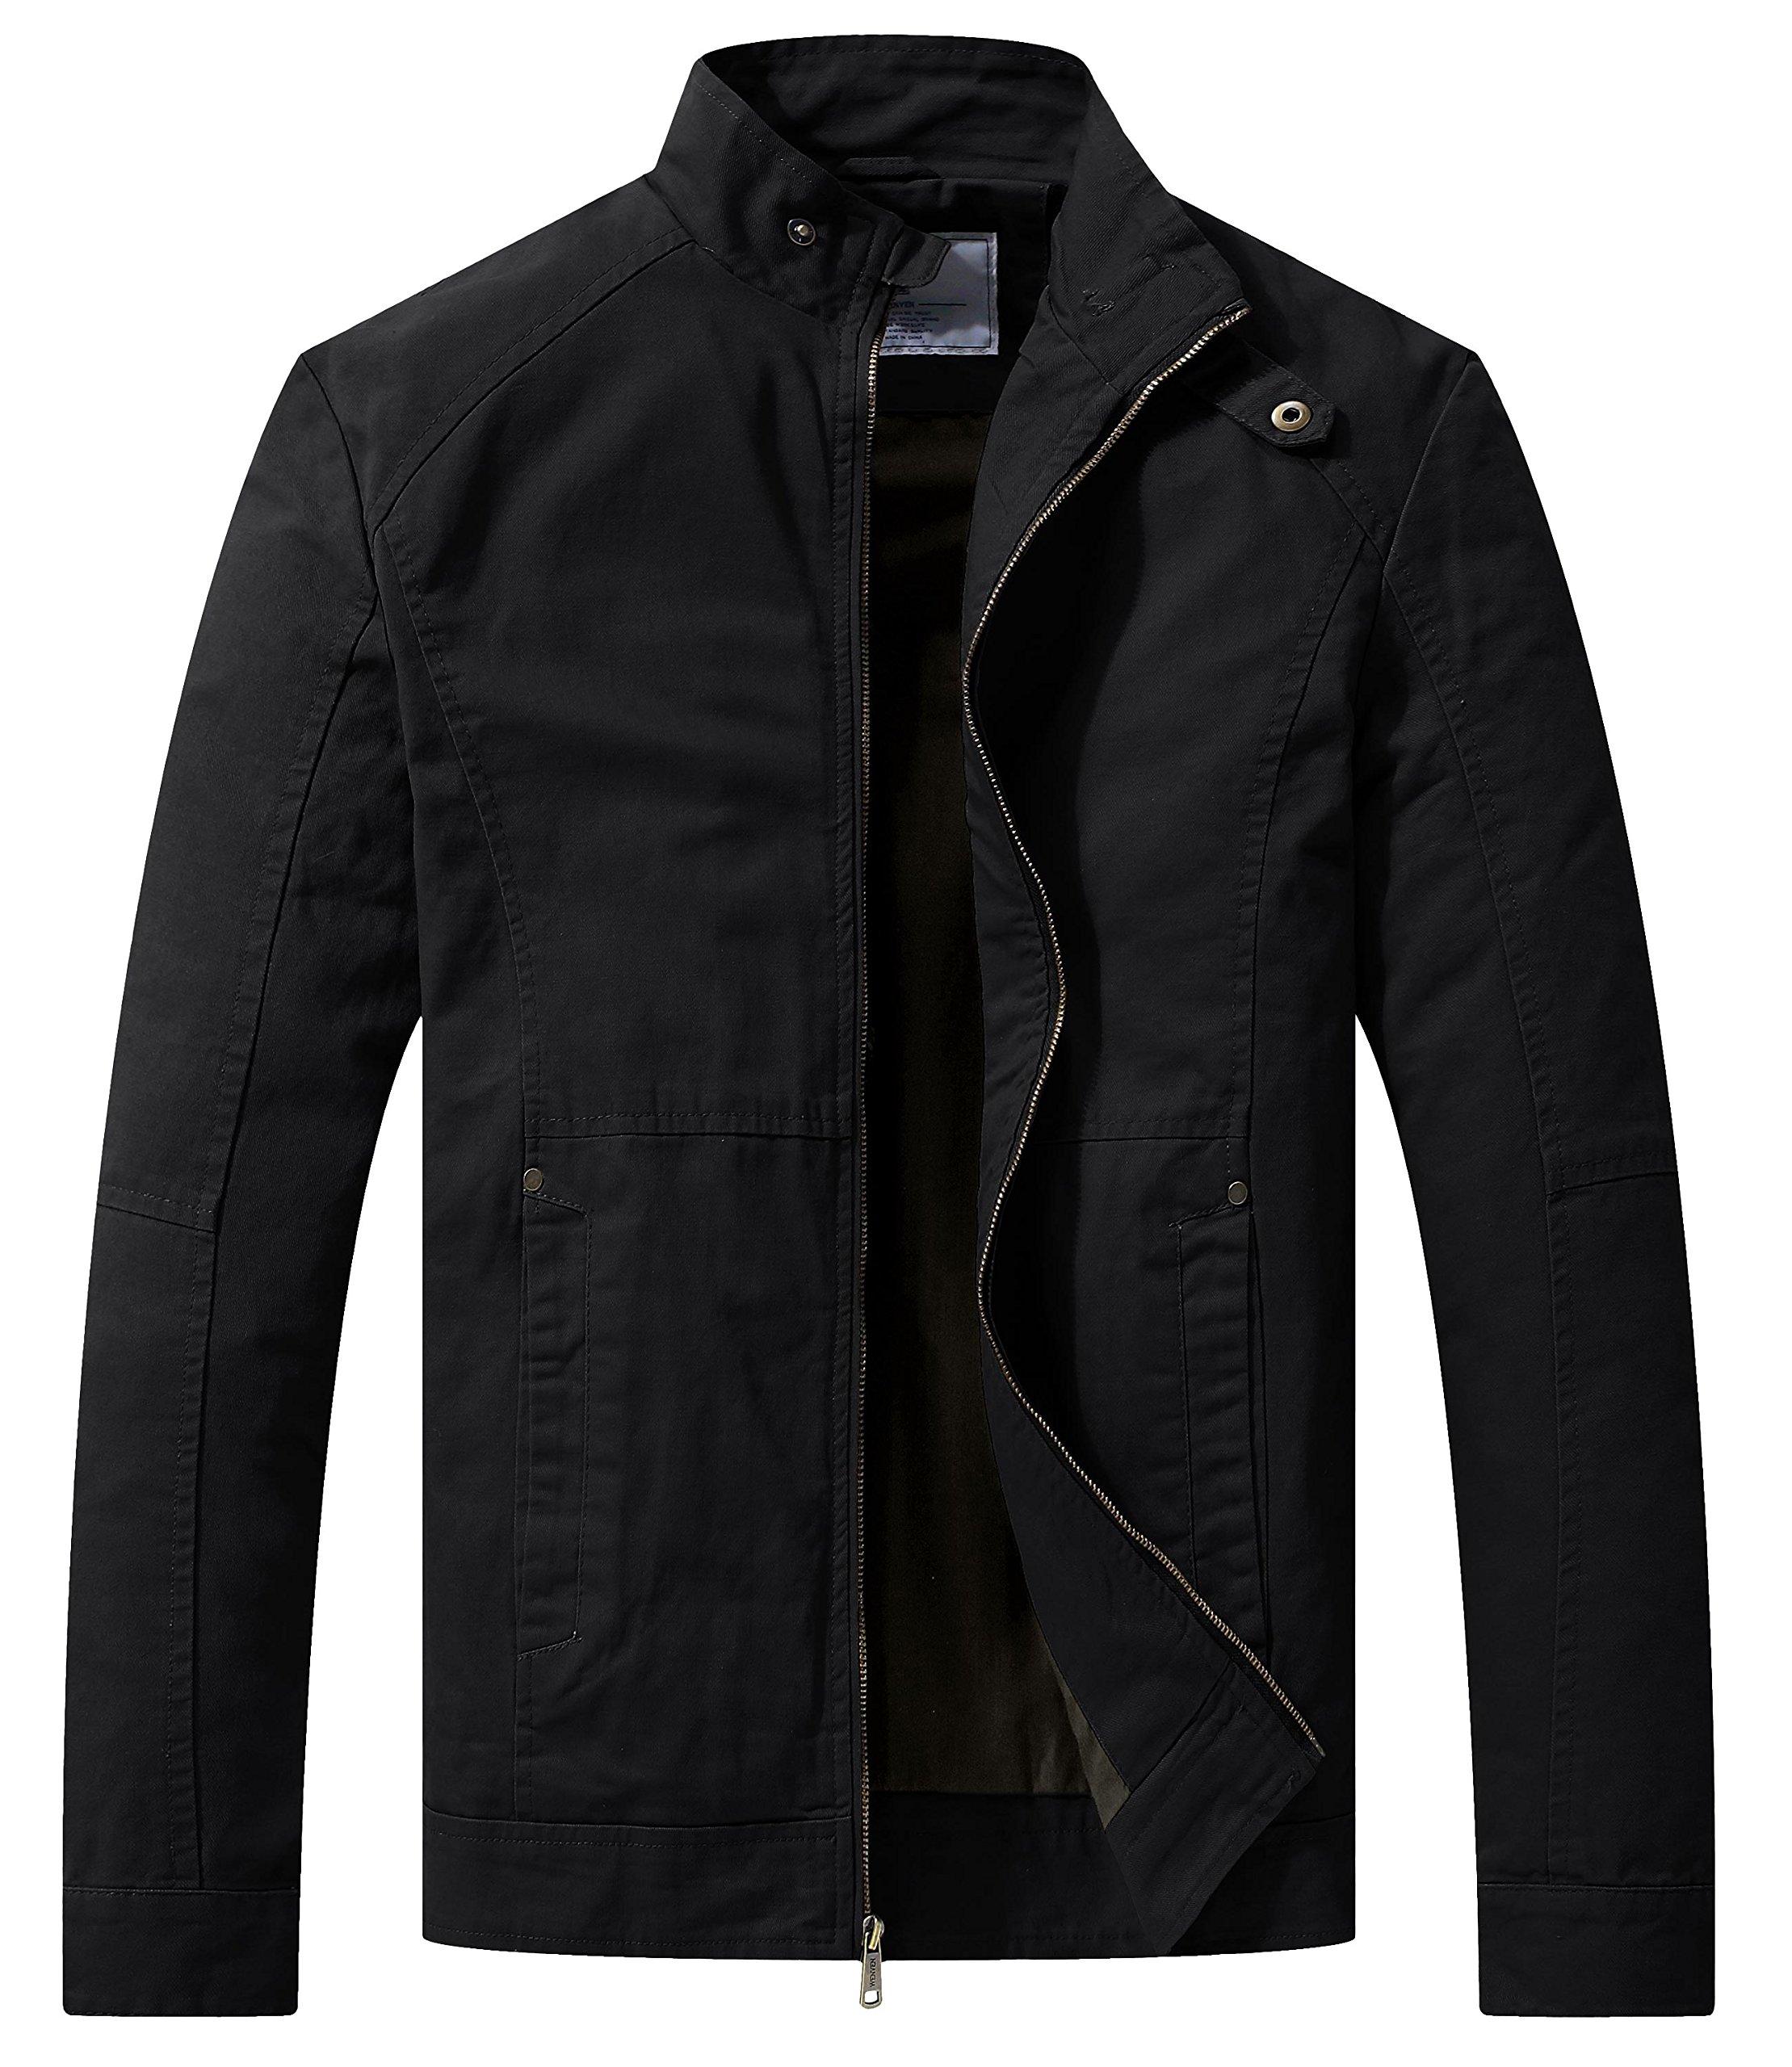 WenVen Men's Spring Casual Lightweight Full Zip Military Jacket(Black,Medium)